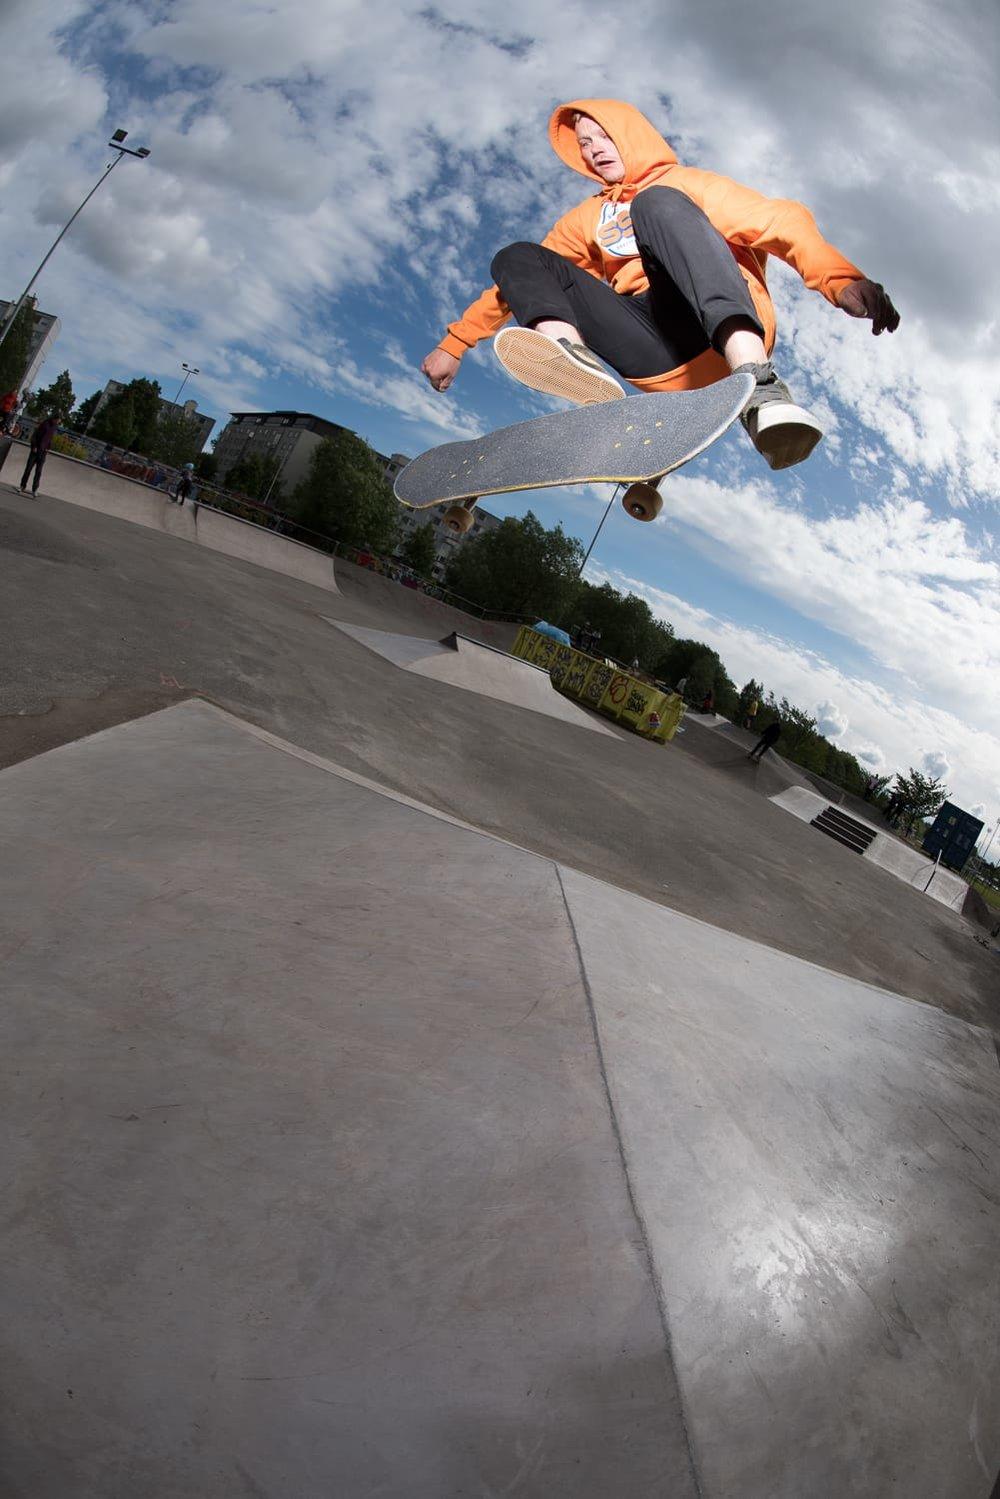 Kisu: Shifty flip | Photo: Aleksi Fräki